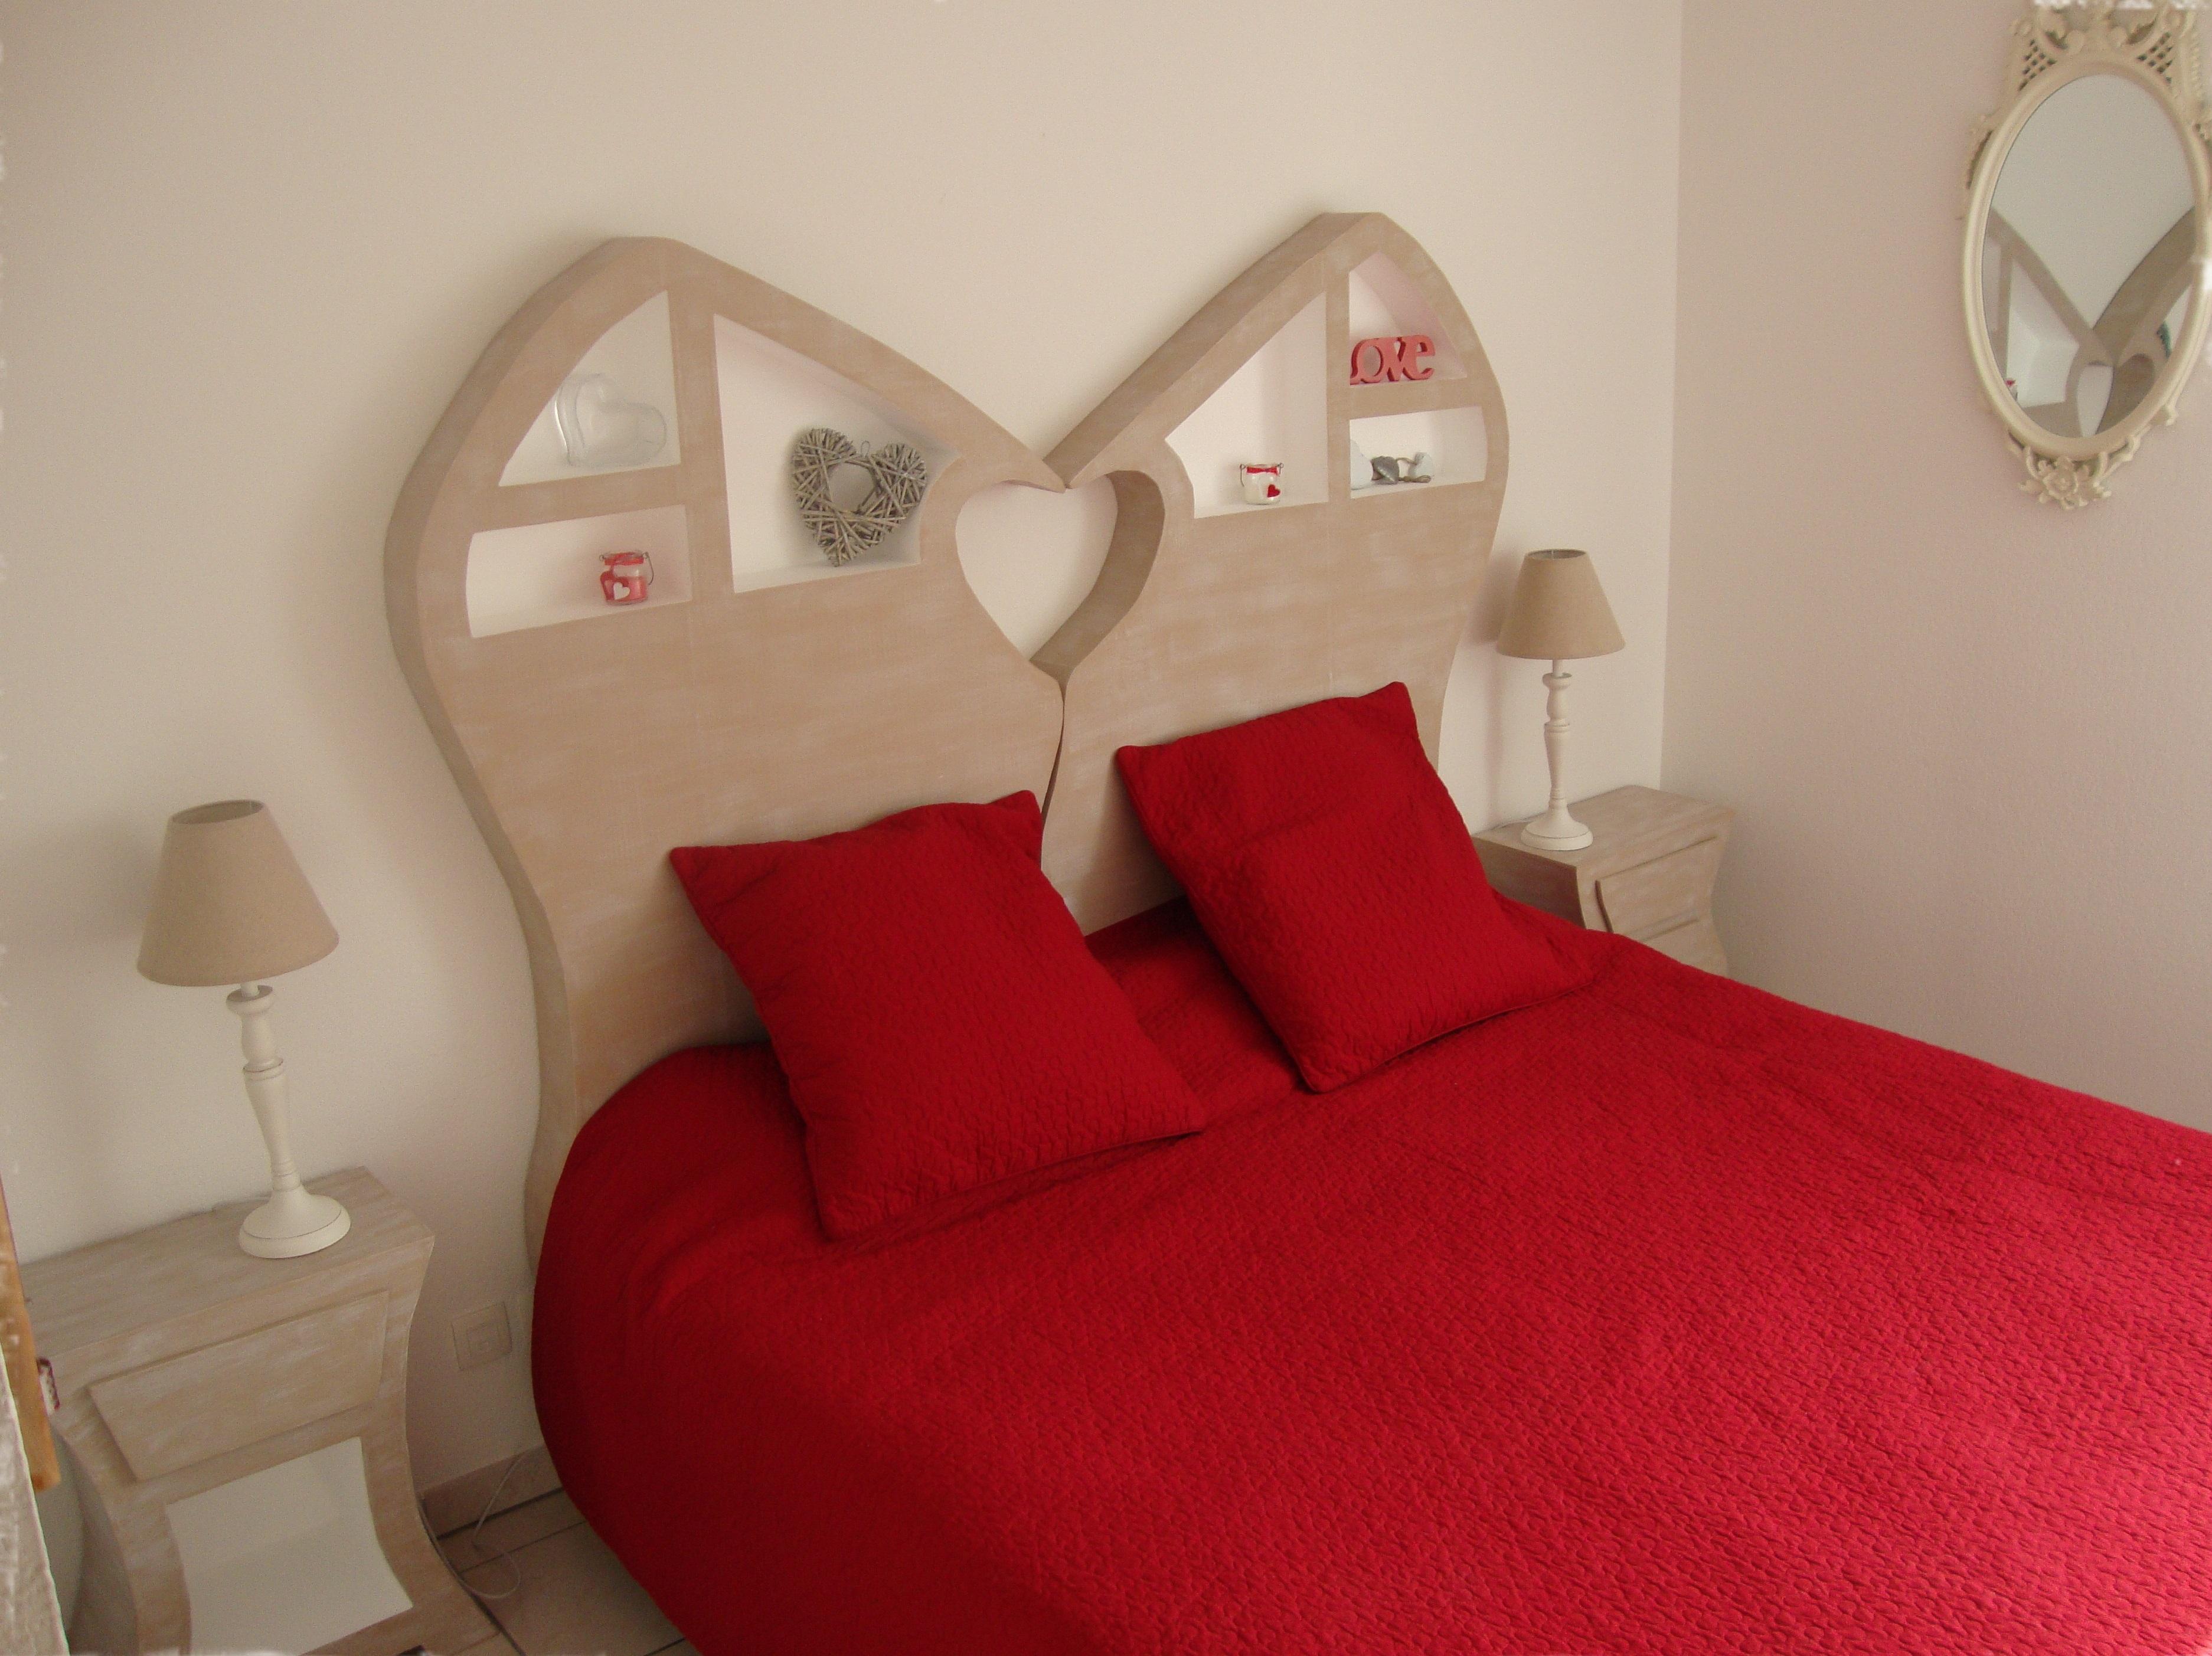 Tete de lit en forme de coeur - Tete de lit en forme de coeur ...